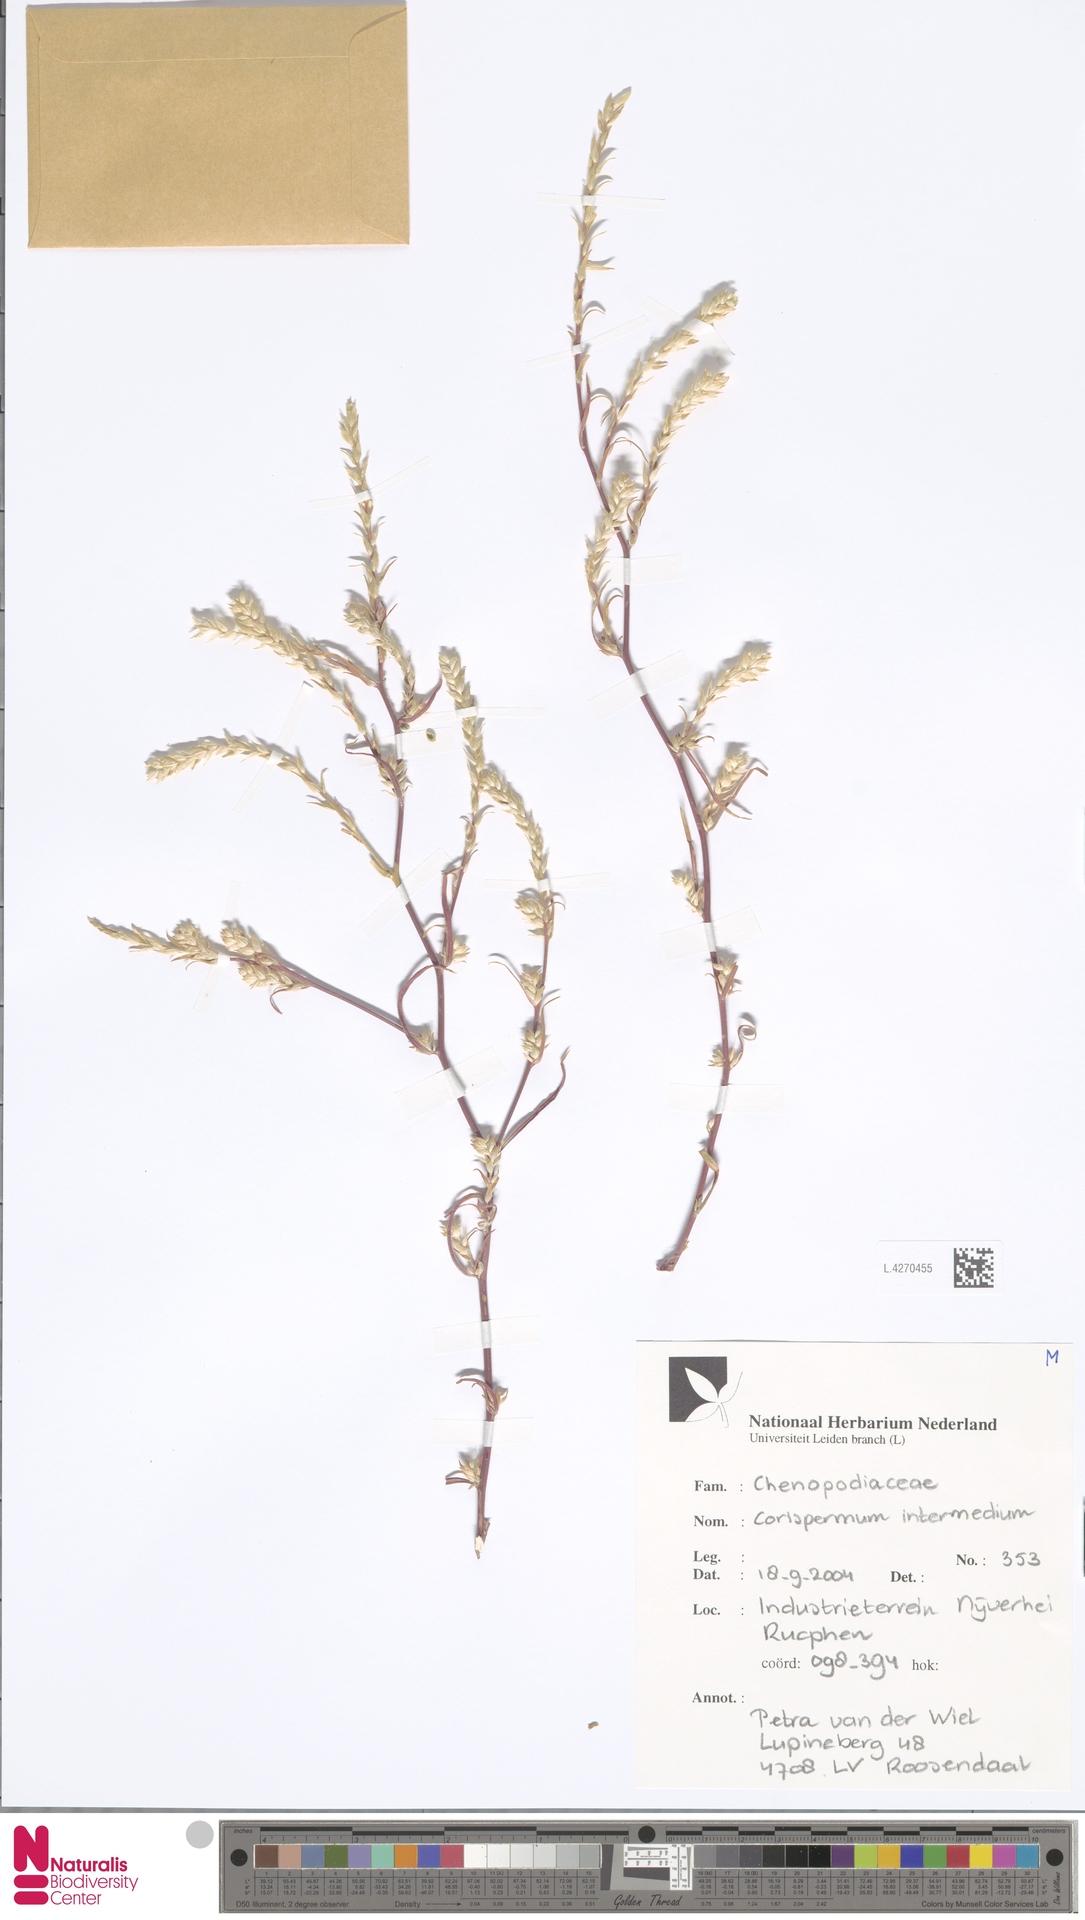 L.4270455 | Corispermum intermedium Schweigg.